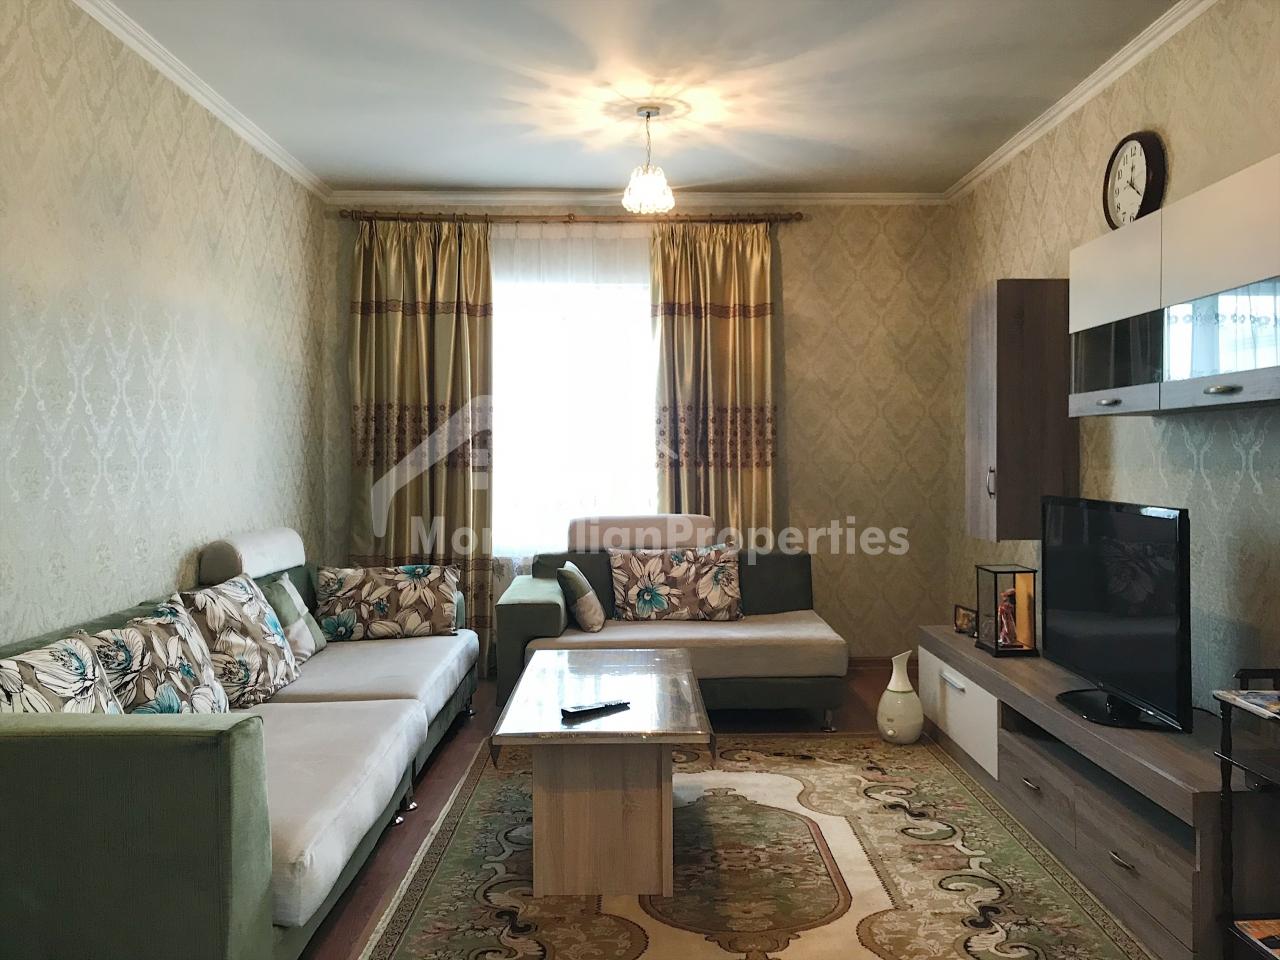 FOR RENT: 1 bedroom apartment in Golomt khotkhon